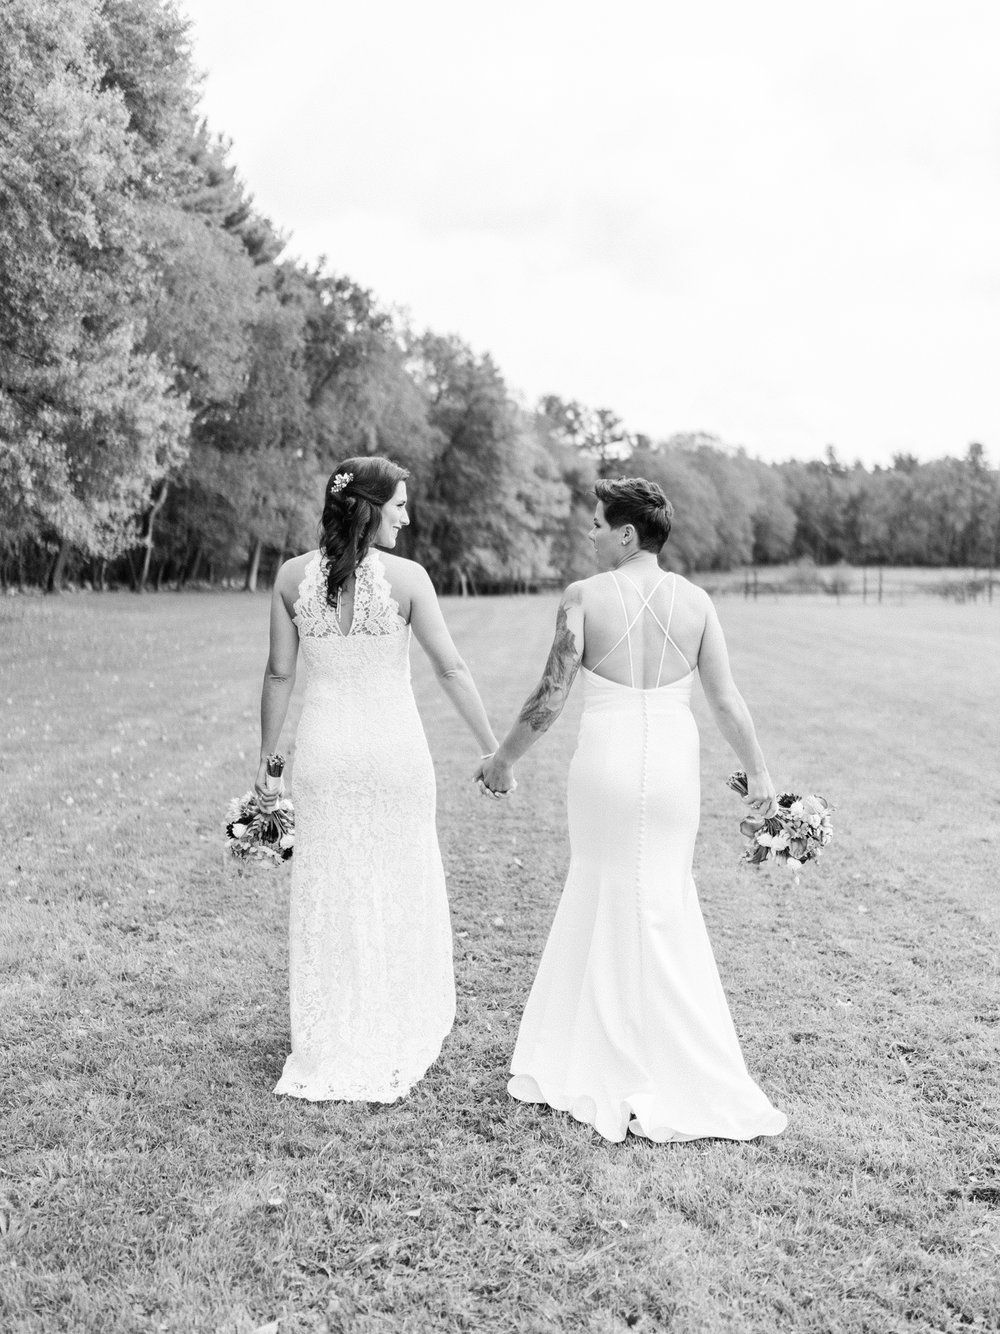 hannah-cochran-photography-kate-and-deb-wedding-01823-2.jpg